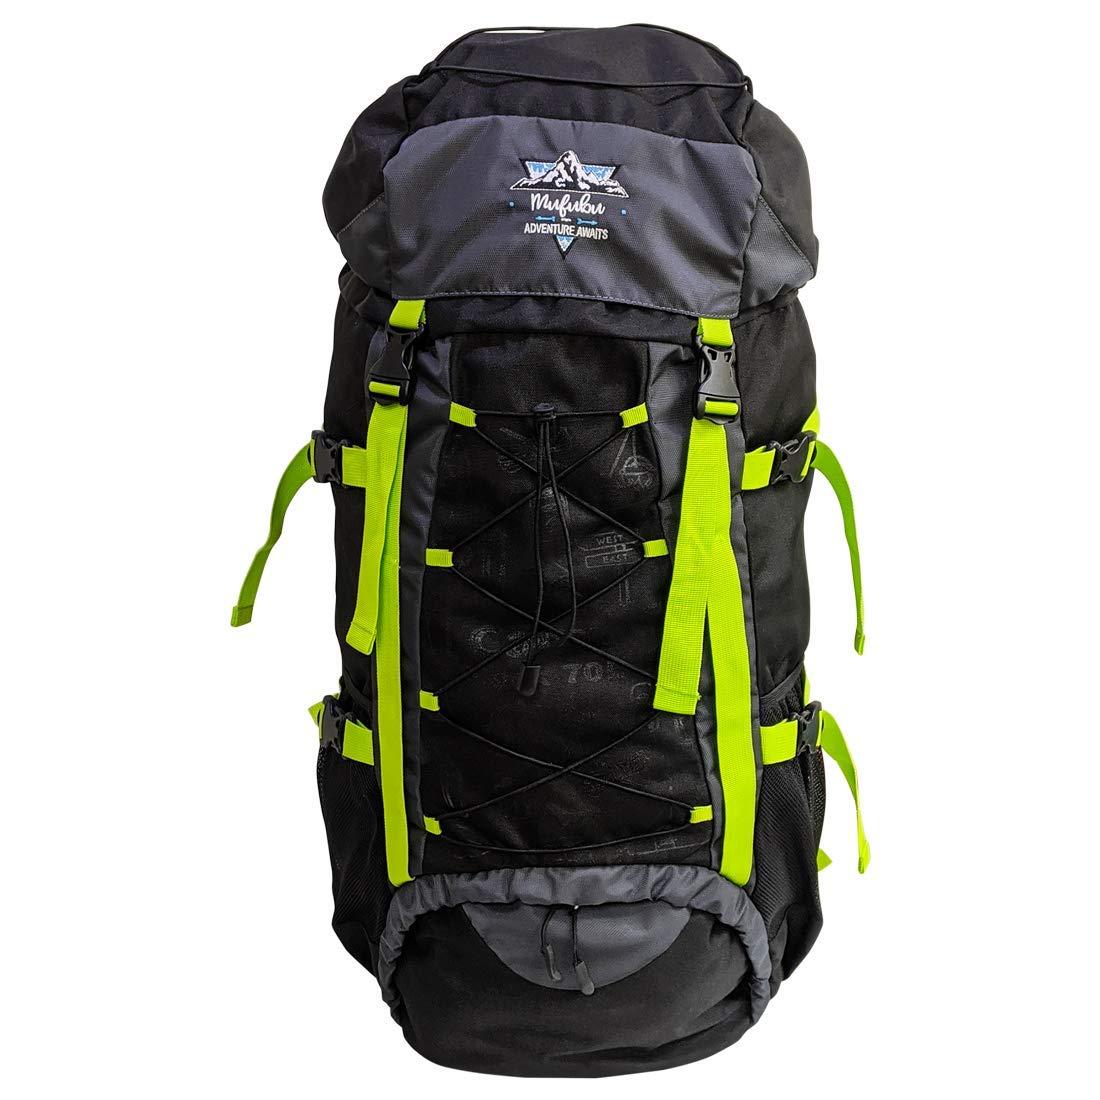 Mufubu, 75ltrs Campsack Rucksack / Camping / Trekking / Hiking Bag for Outdoor Sports,Travelling Backpack. Best Of Rucksacks & Hiking Trekking Bags in India